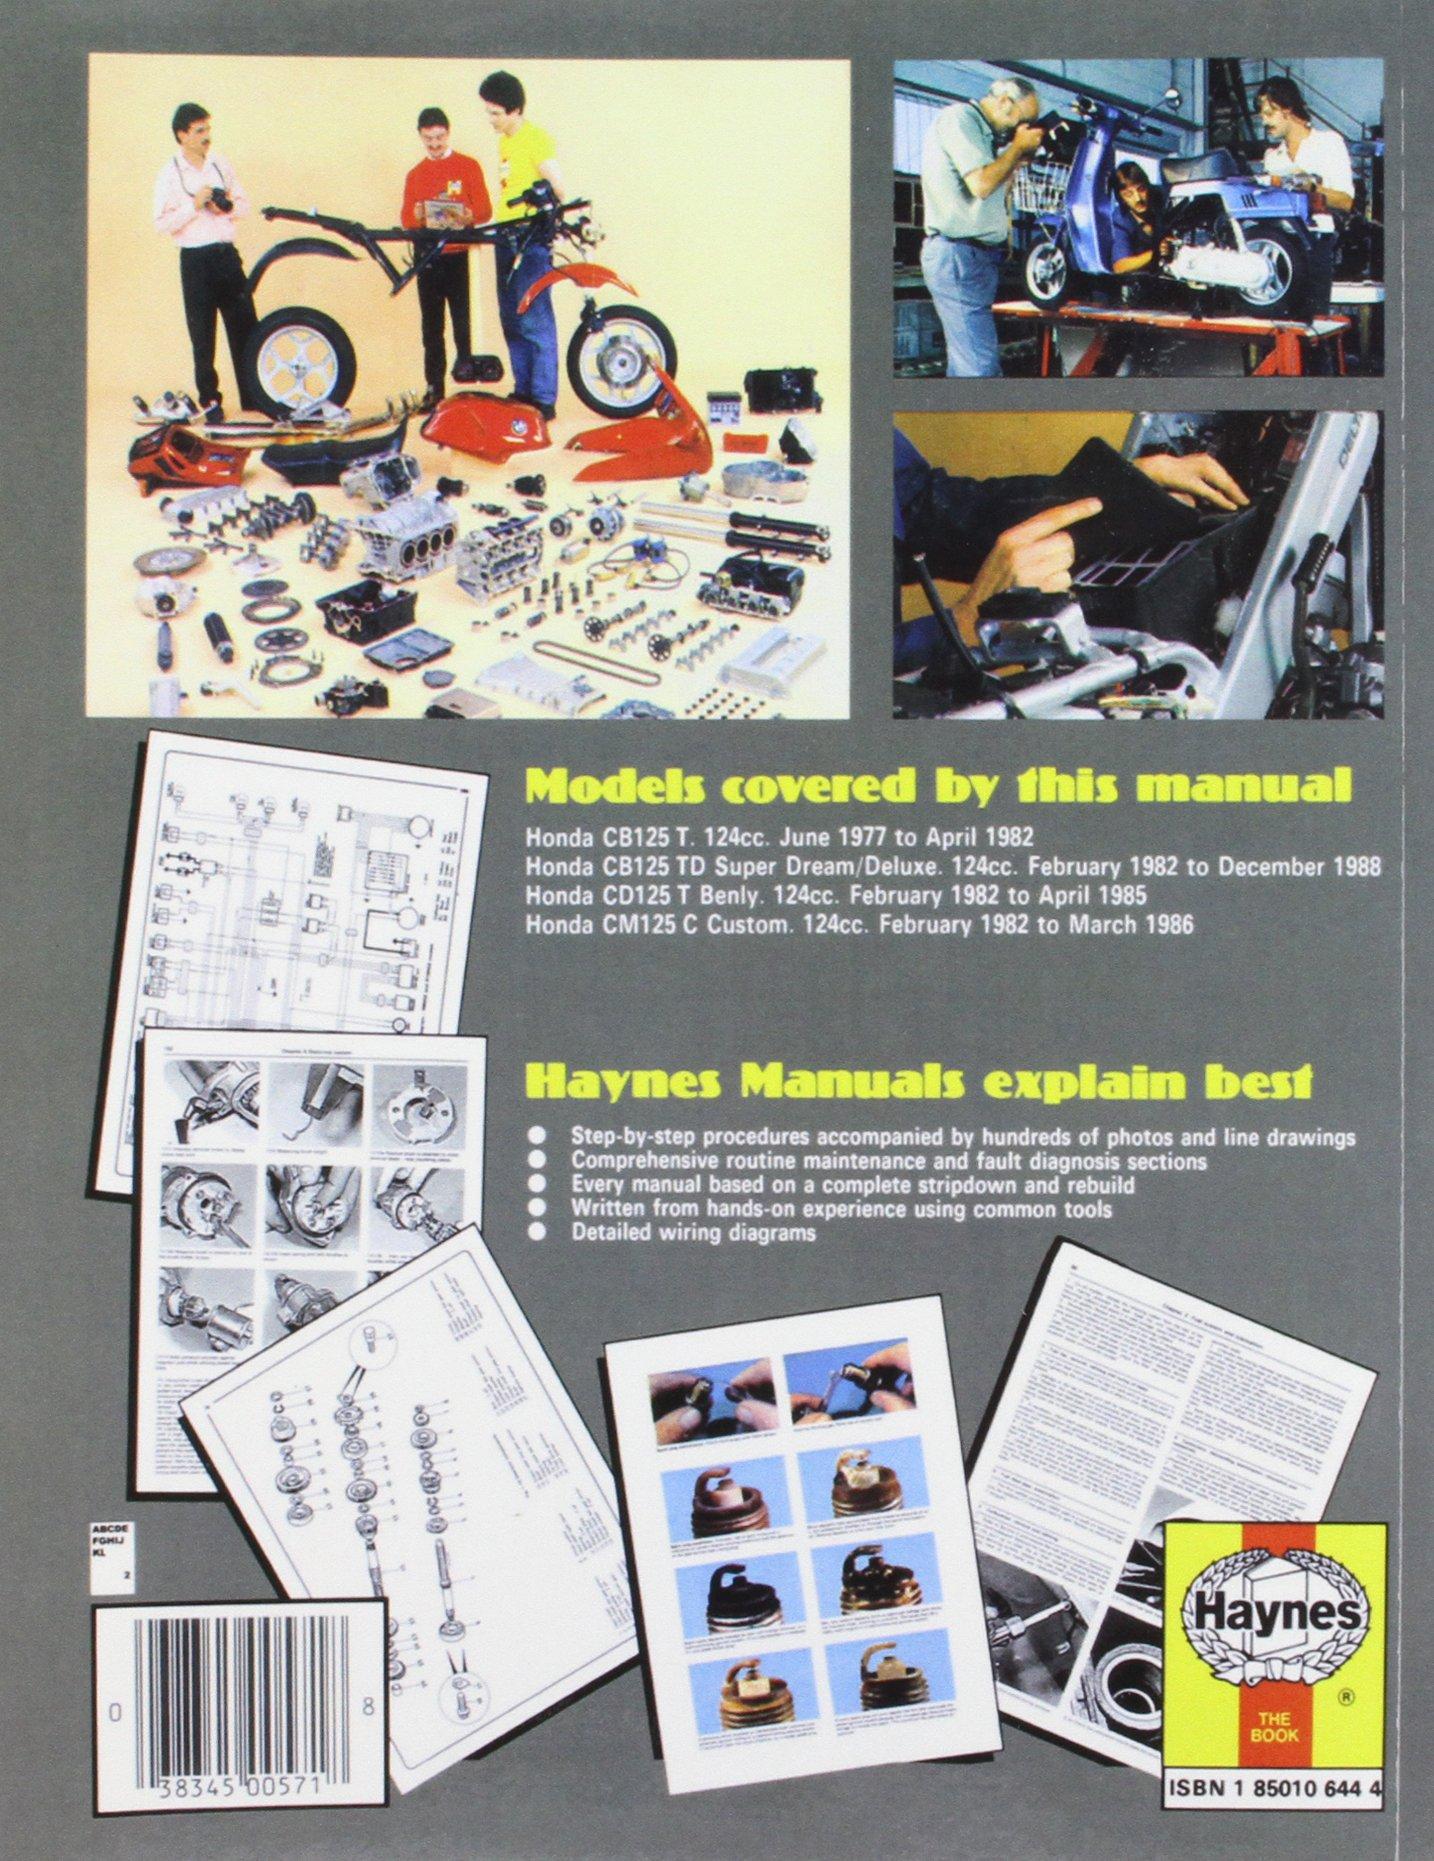 Honda Cb175 Wiring Diagram Schematic Diagrams 1969 Cb 125 T Trusted 175